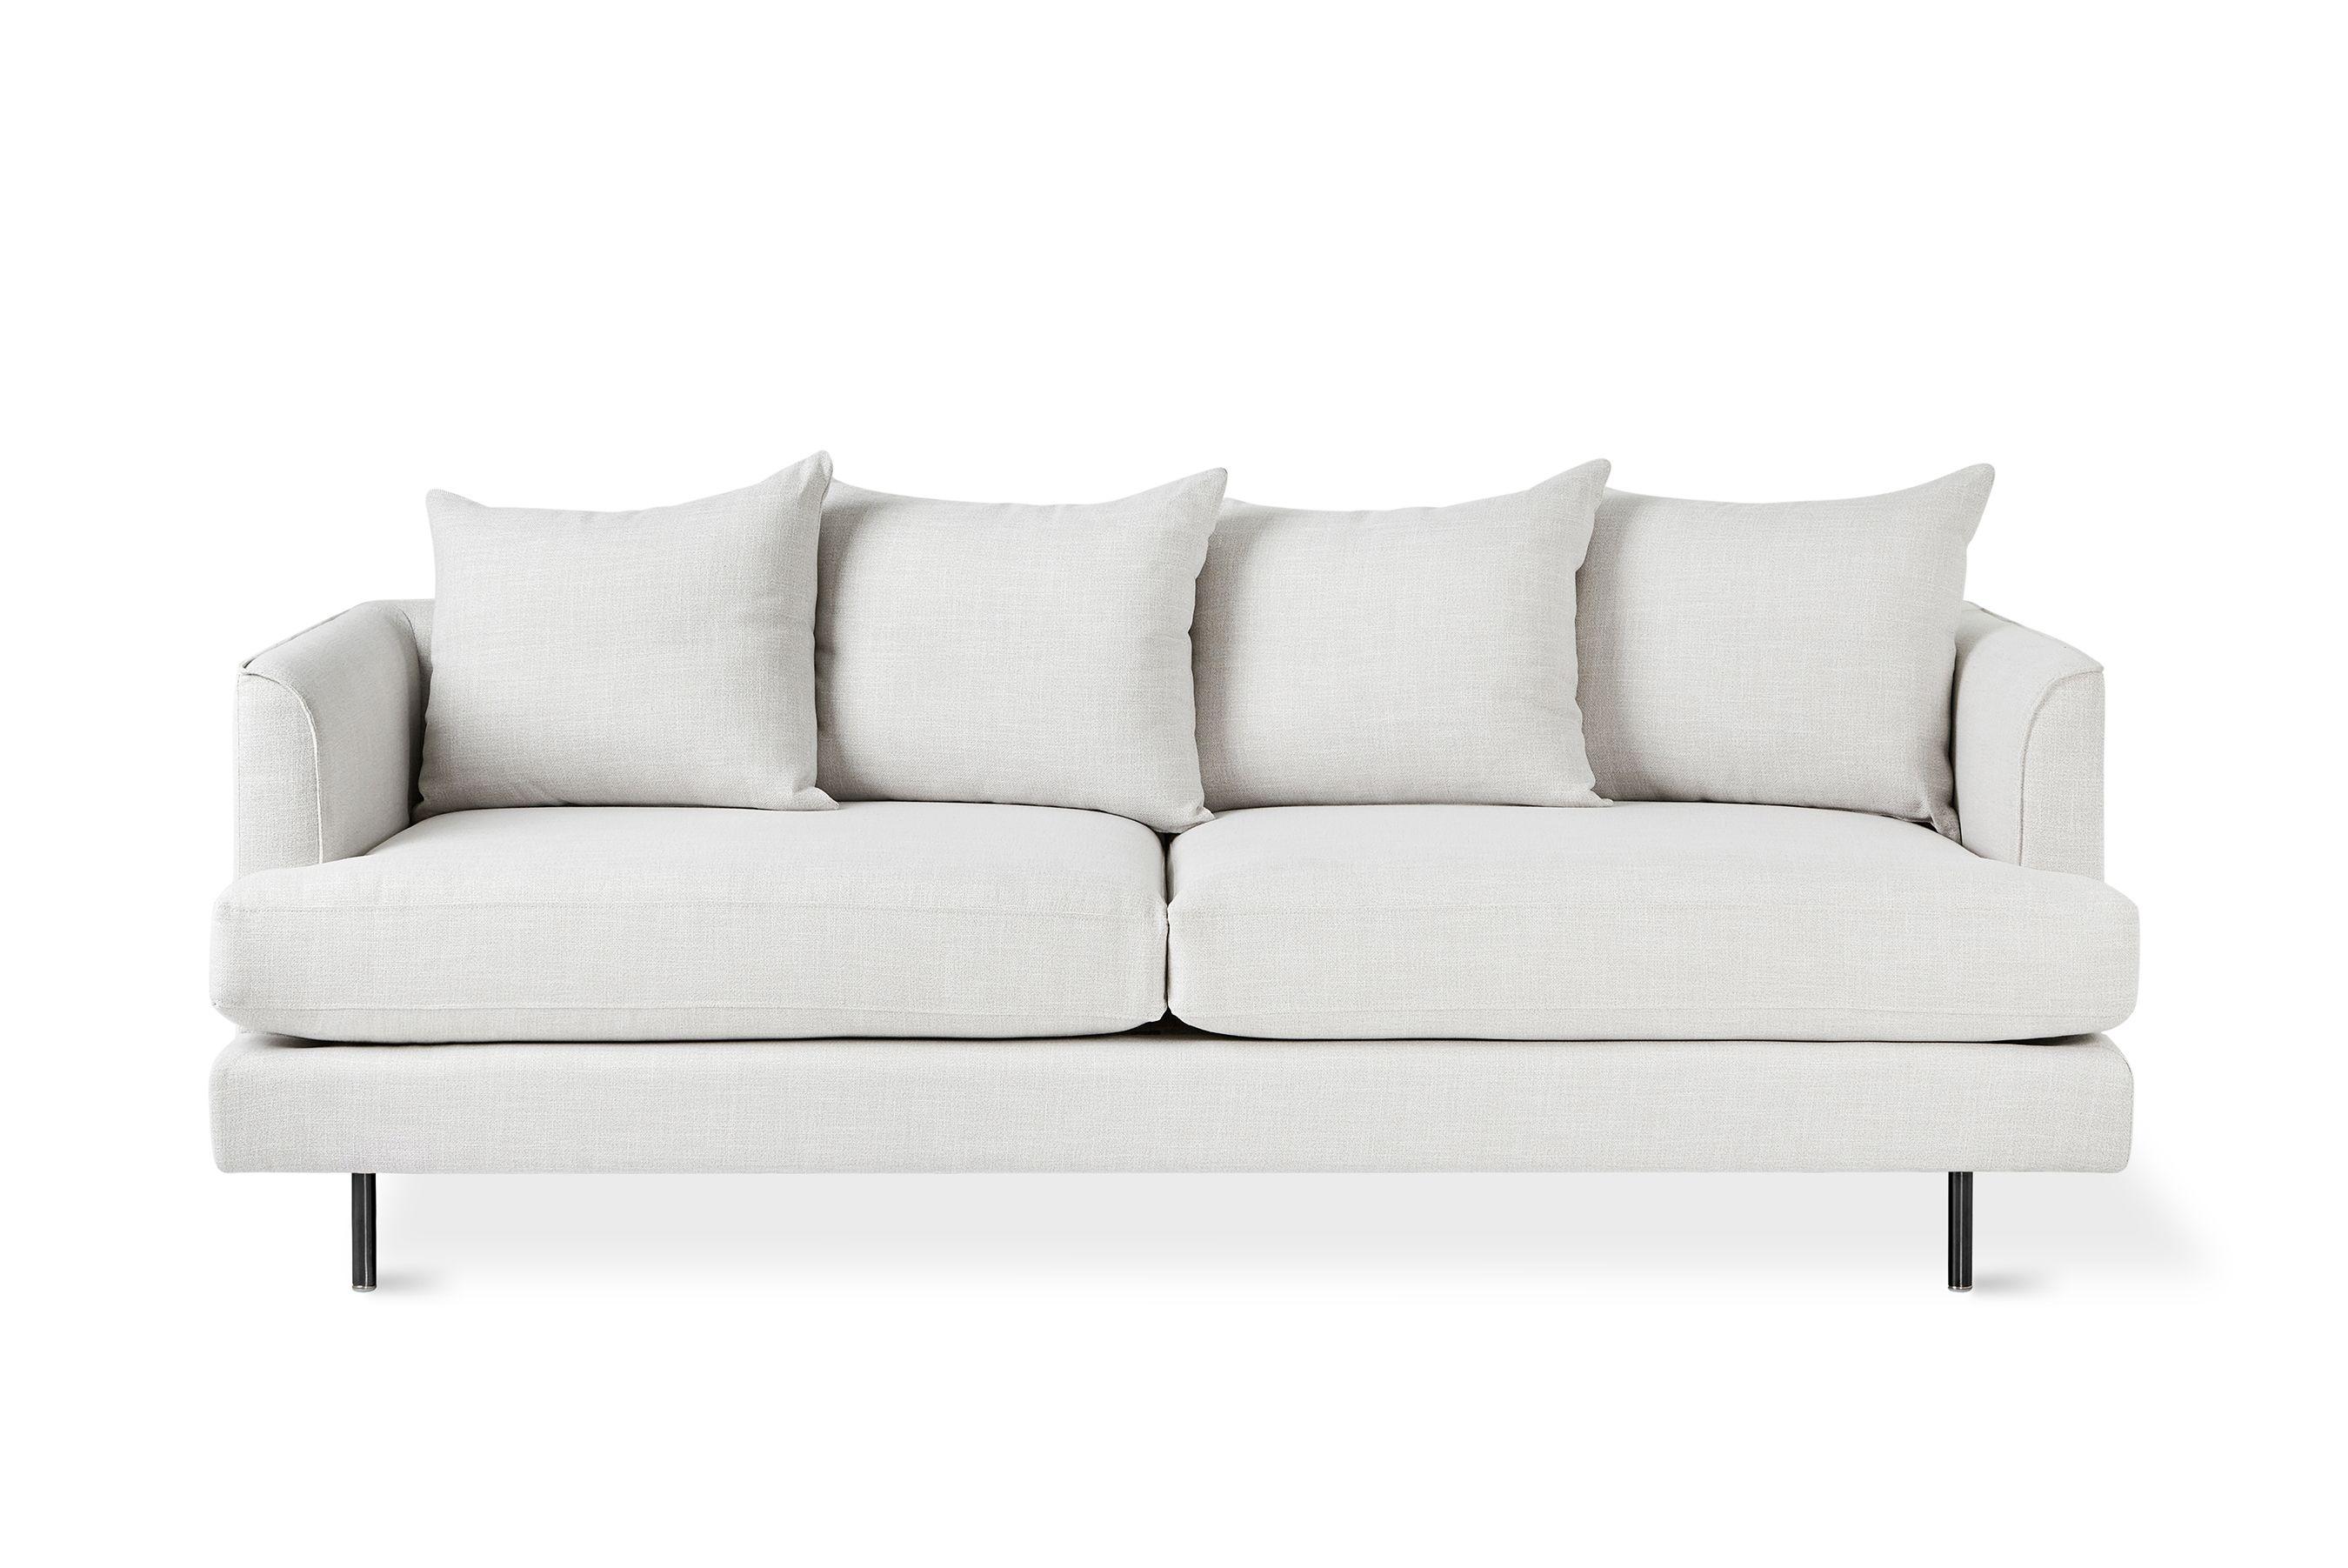 Gus modern the margot sofa epitomizes modern elegance with